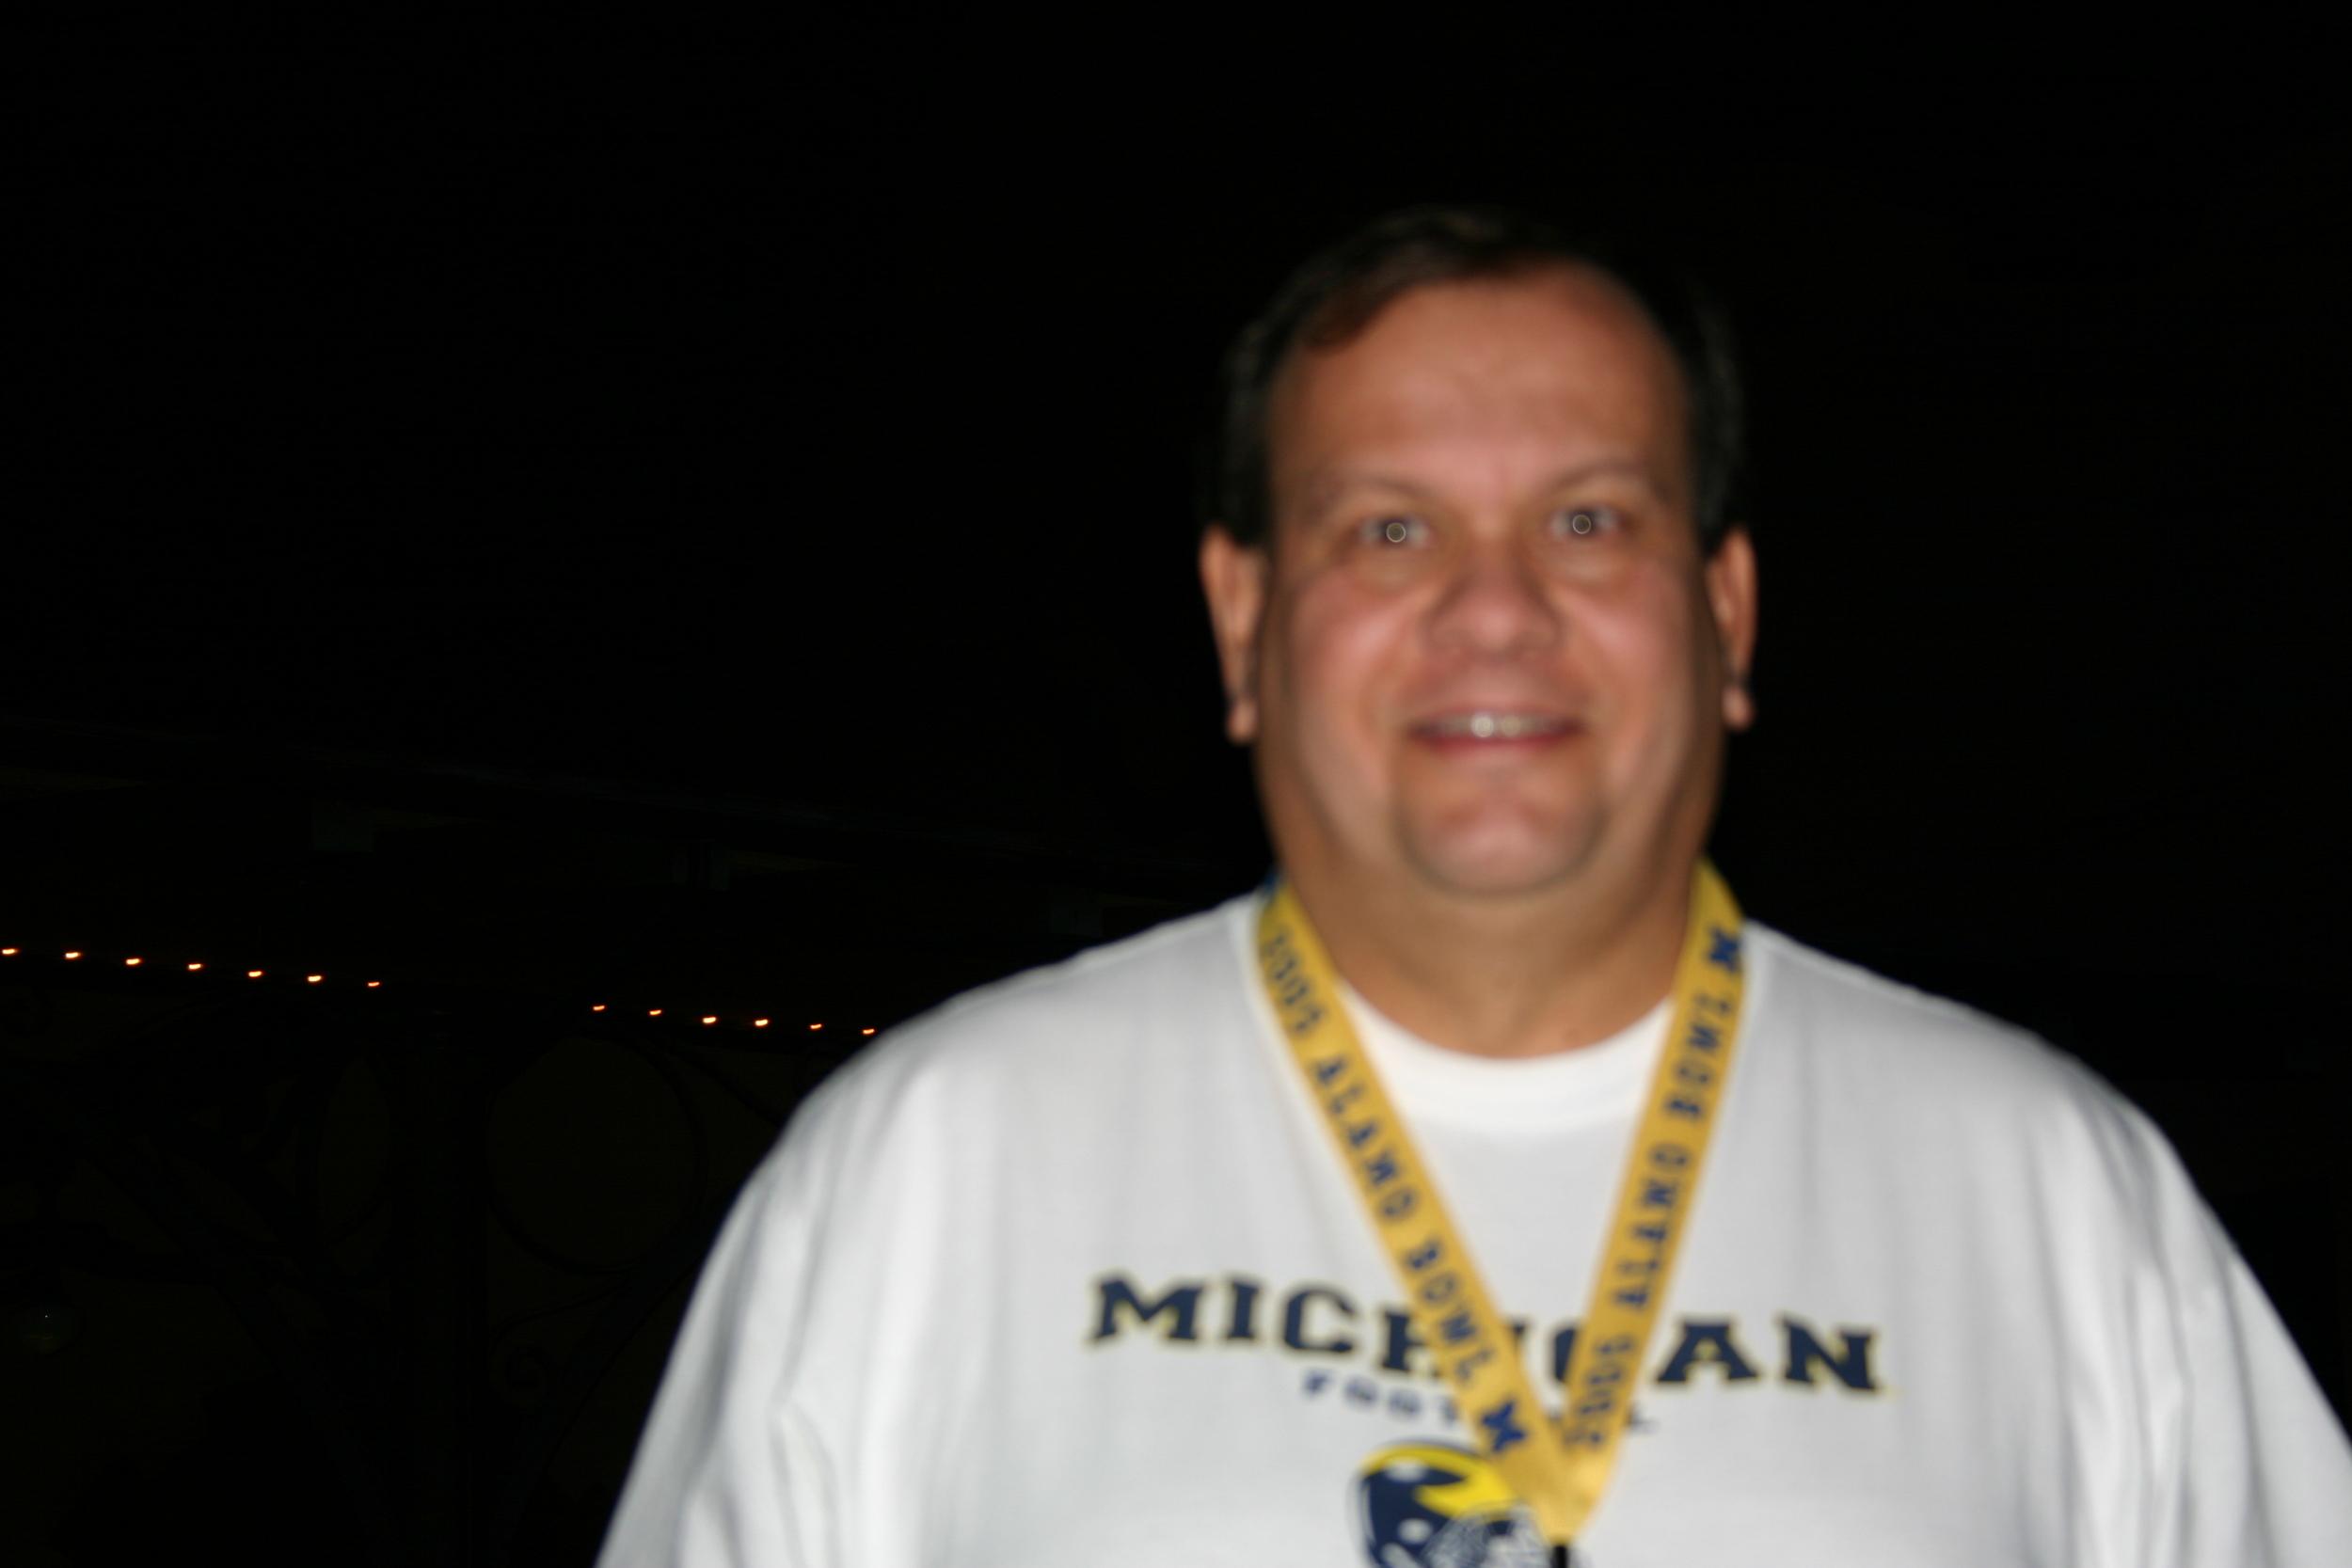 Alamo Bowl 2005 124.jpg